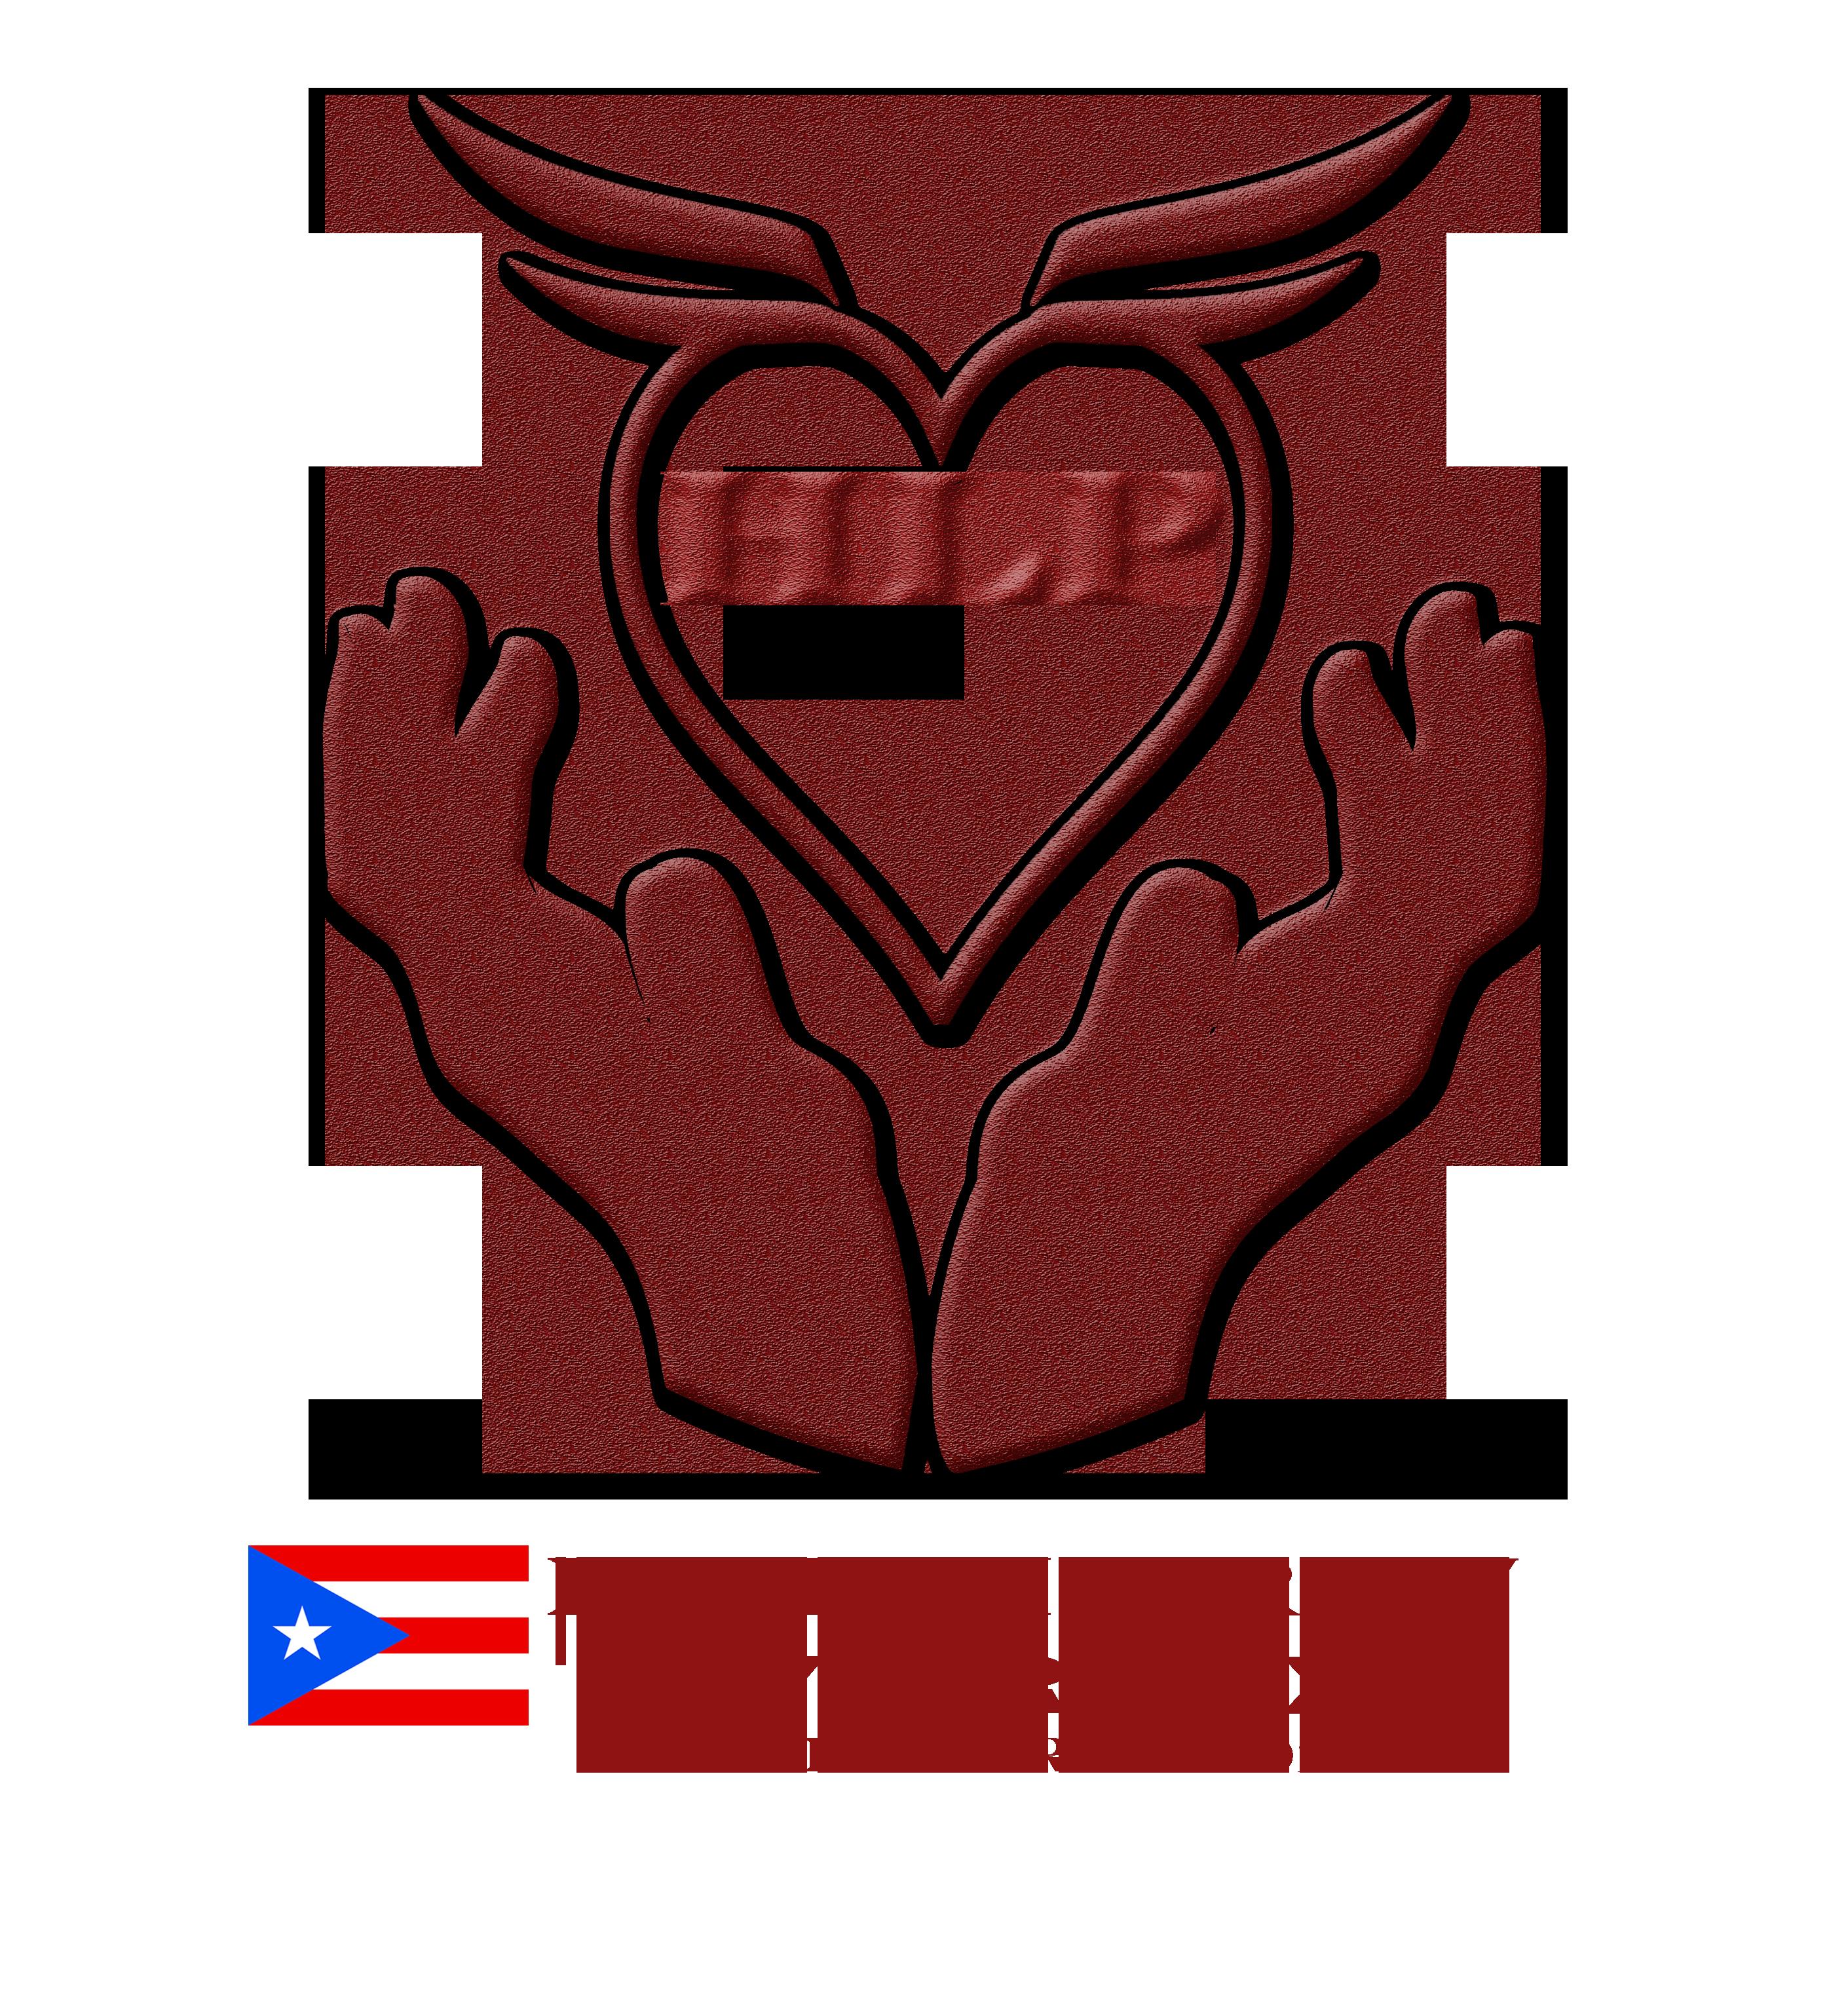 www.hlpair.org